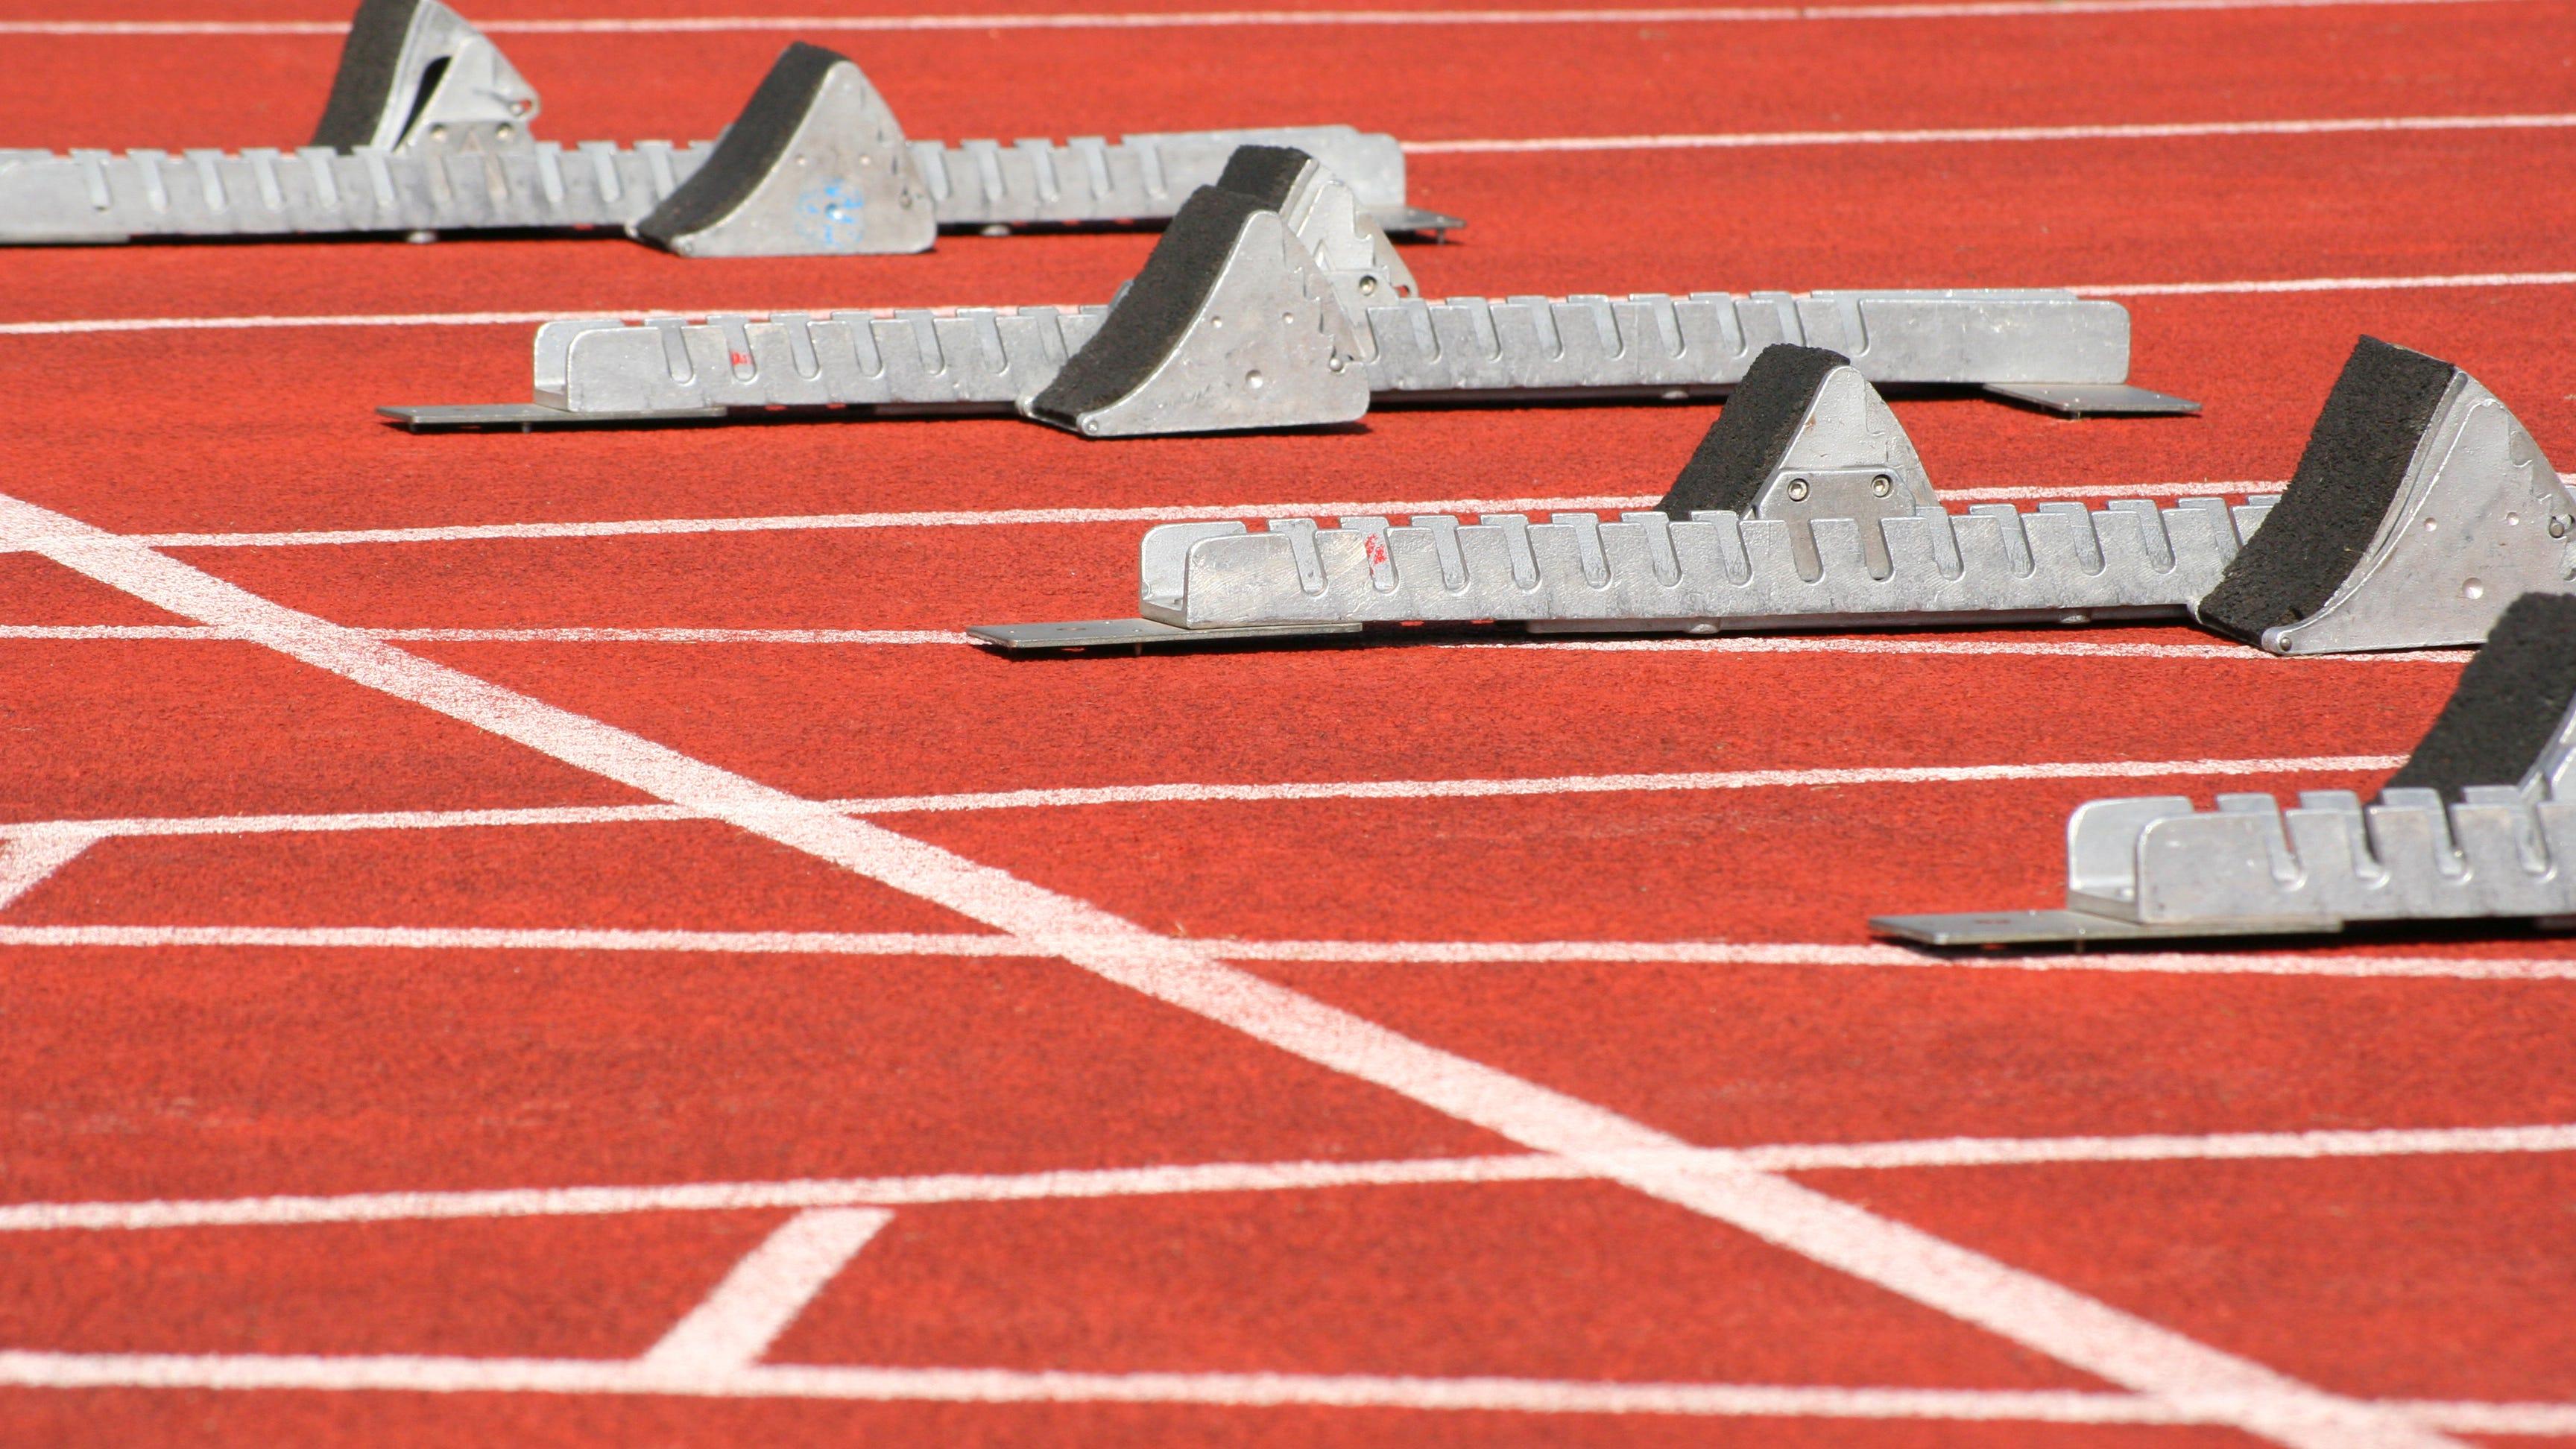 TCU sprinter Baker takes fifth in Tokyo Olympics 100M final